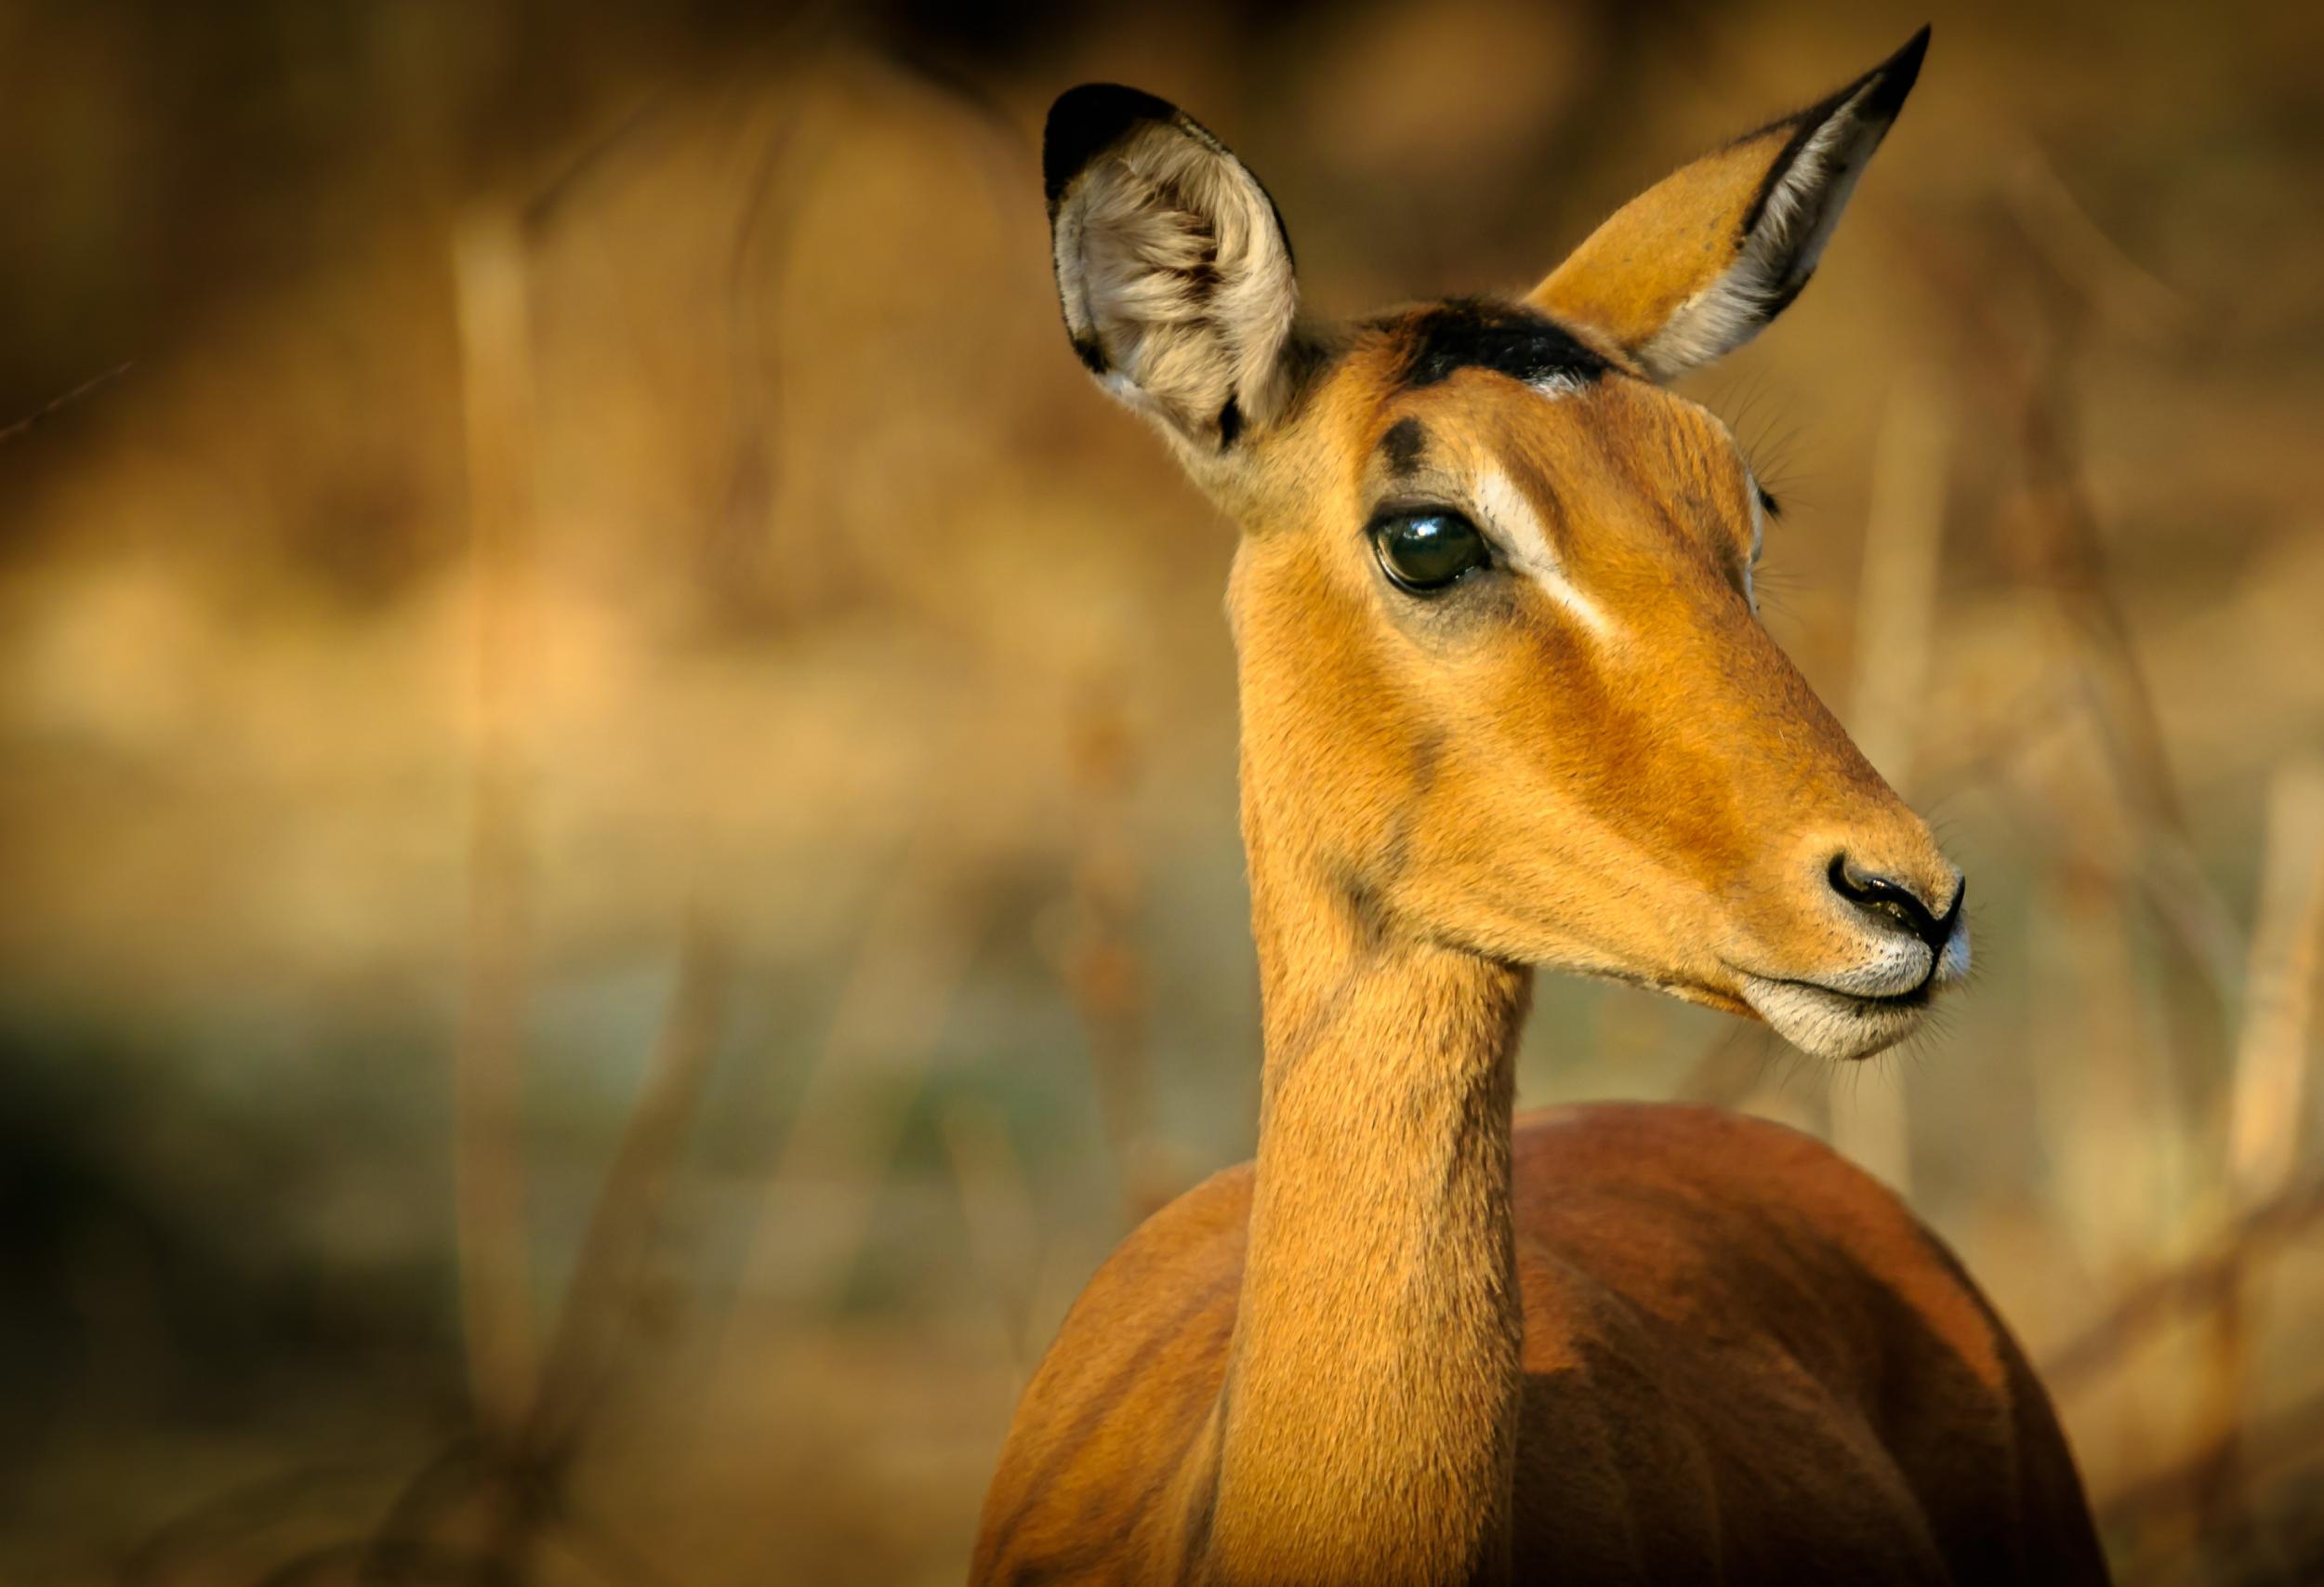 Animal Photography – How to Take Amazing Animal Photos